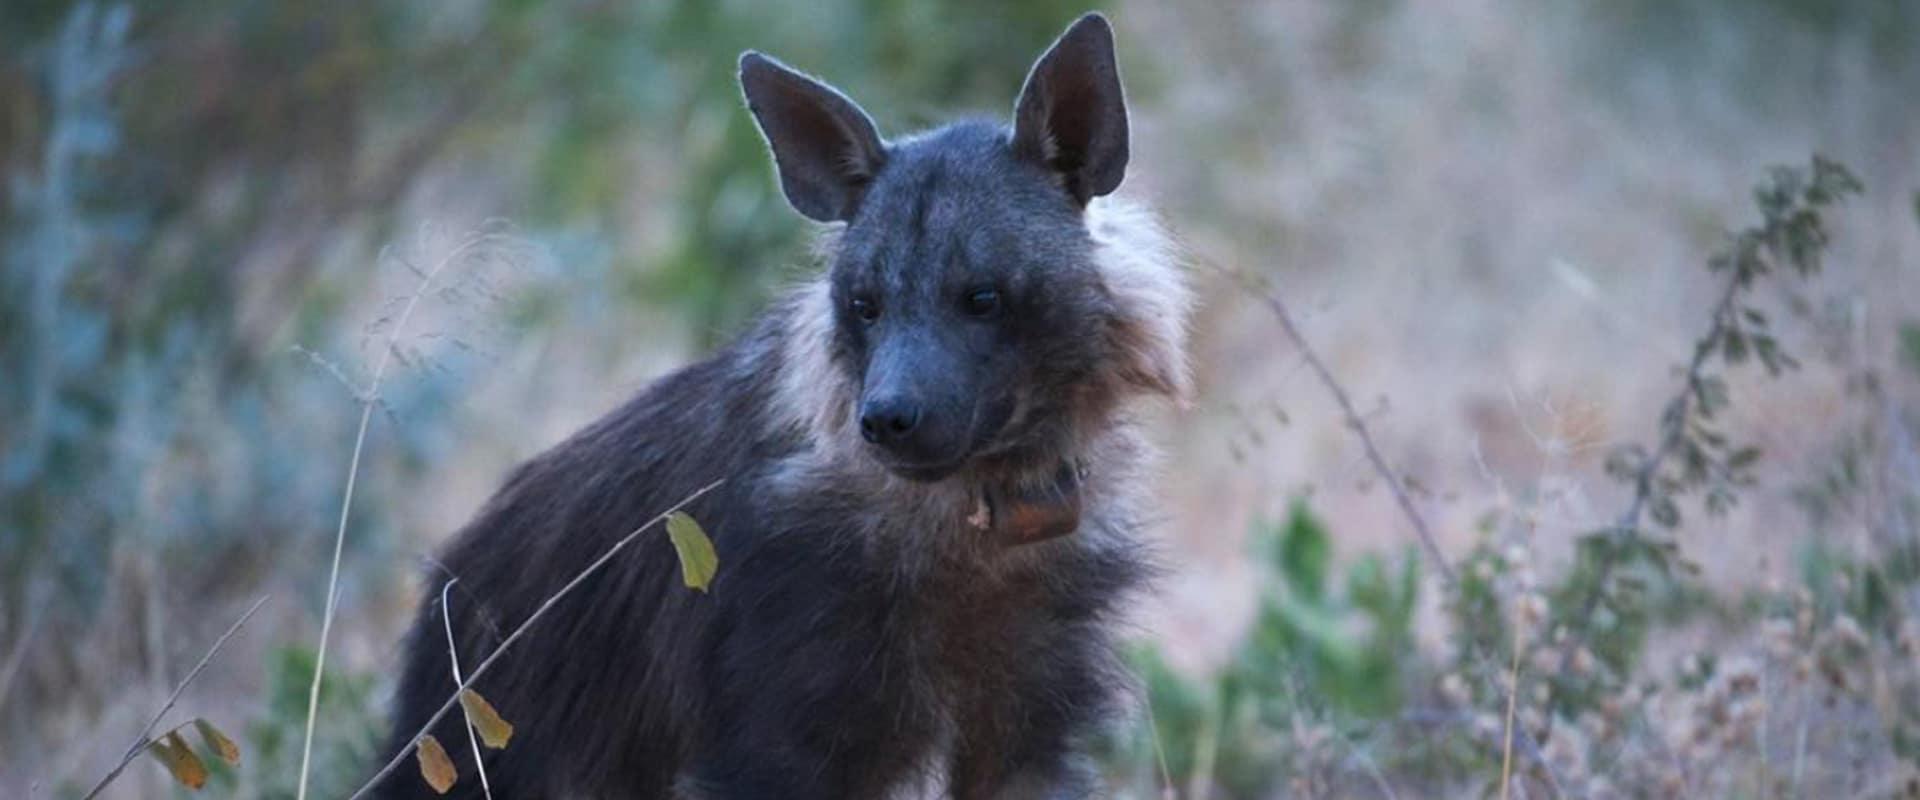 Track hyena on foot